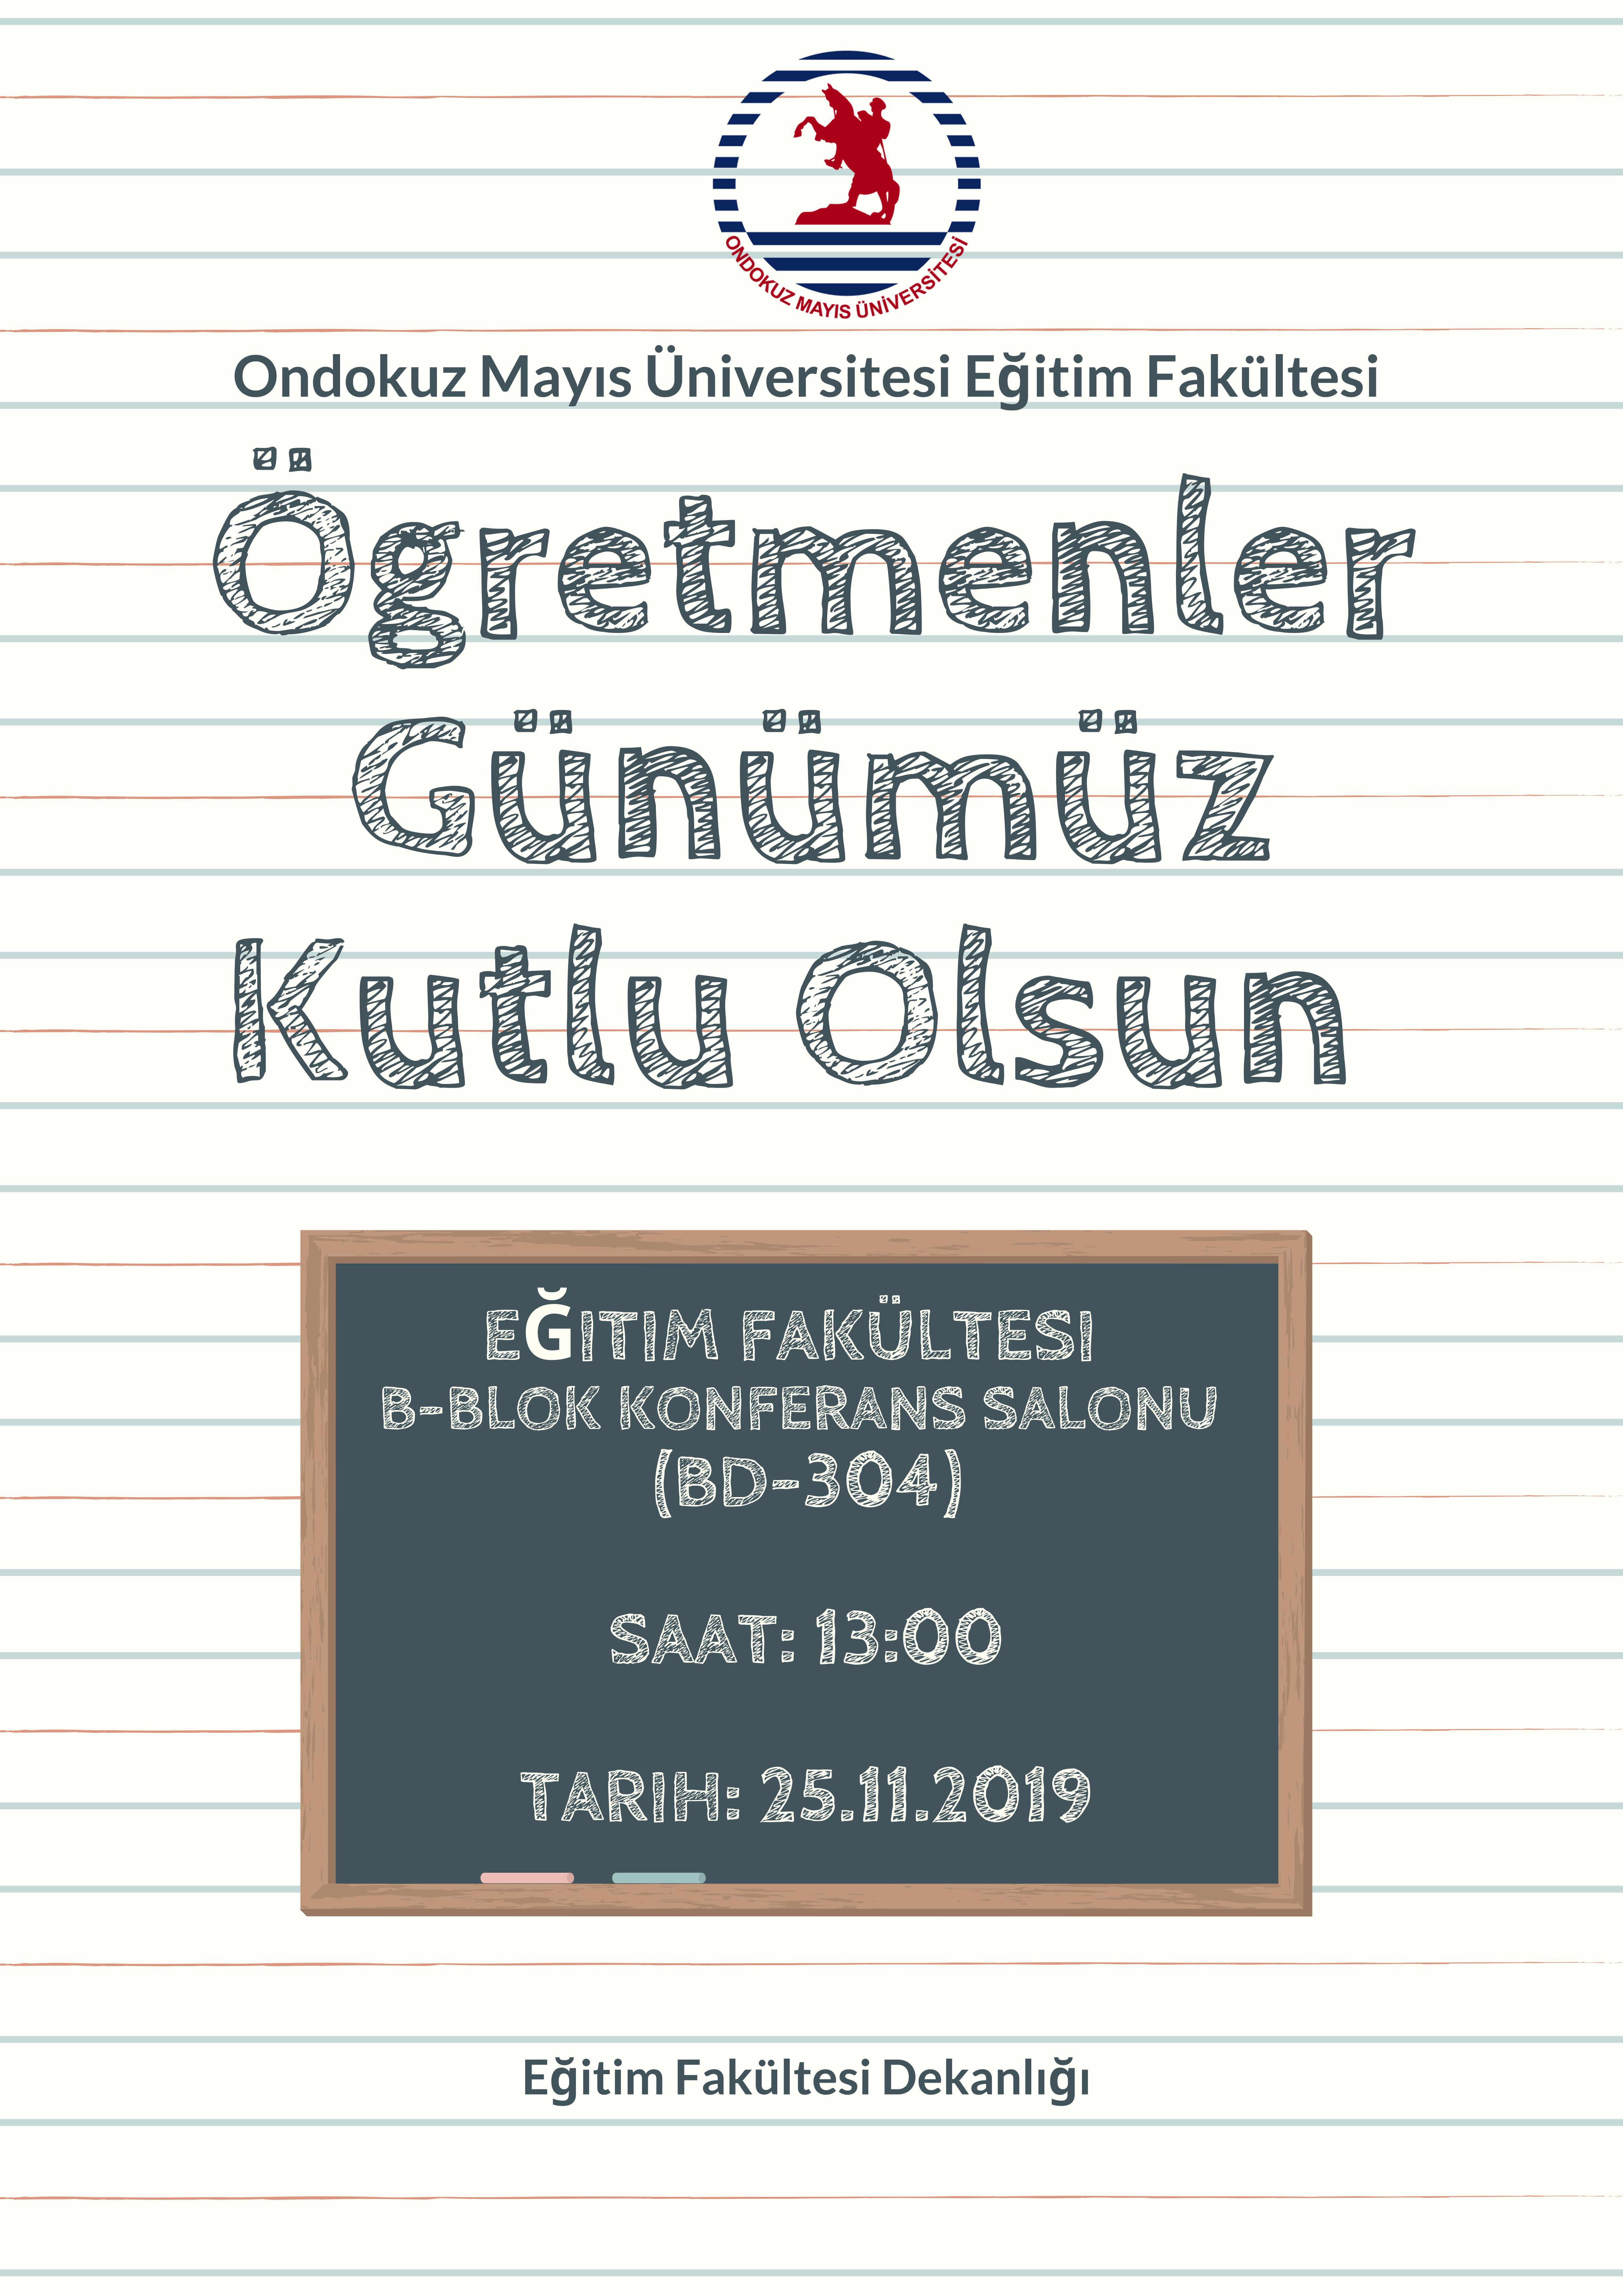 http://www.omu.edu.tr/sites/default/files/ogretmenler_gunumuz_kutlu_olsun.jpg